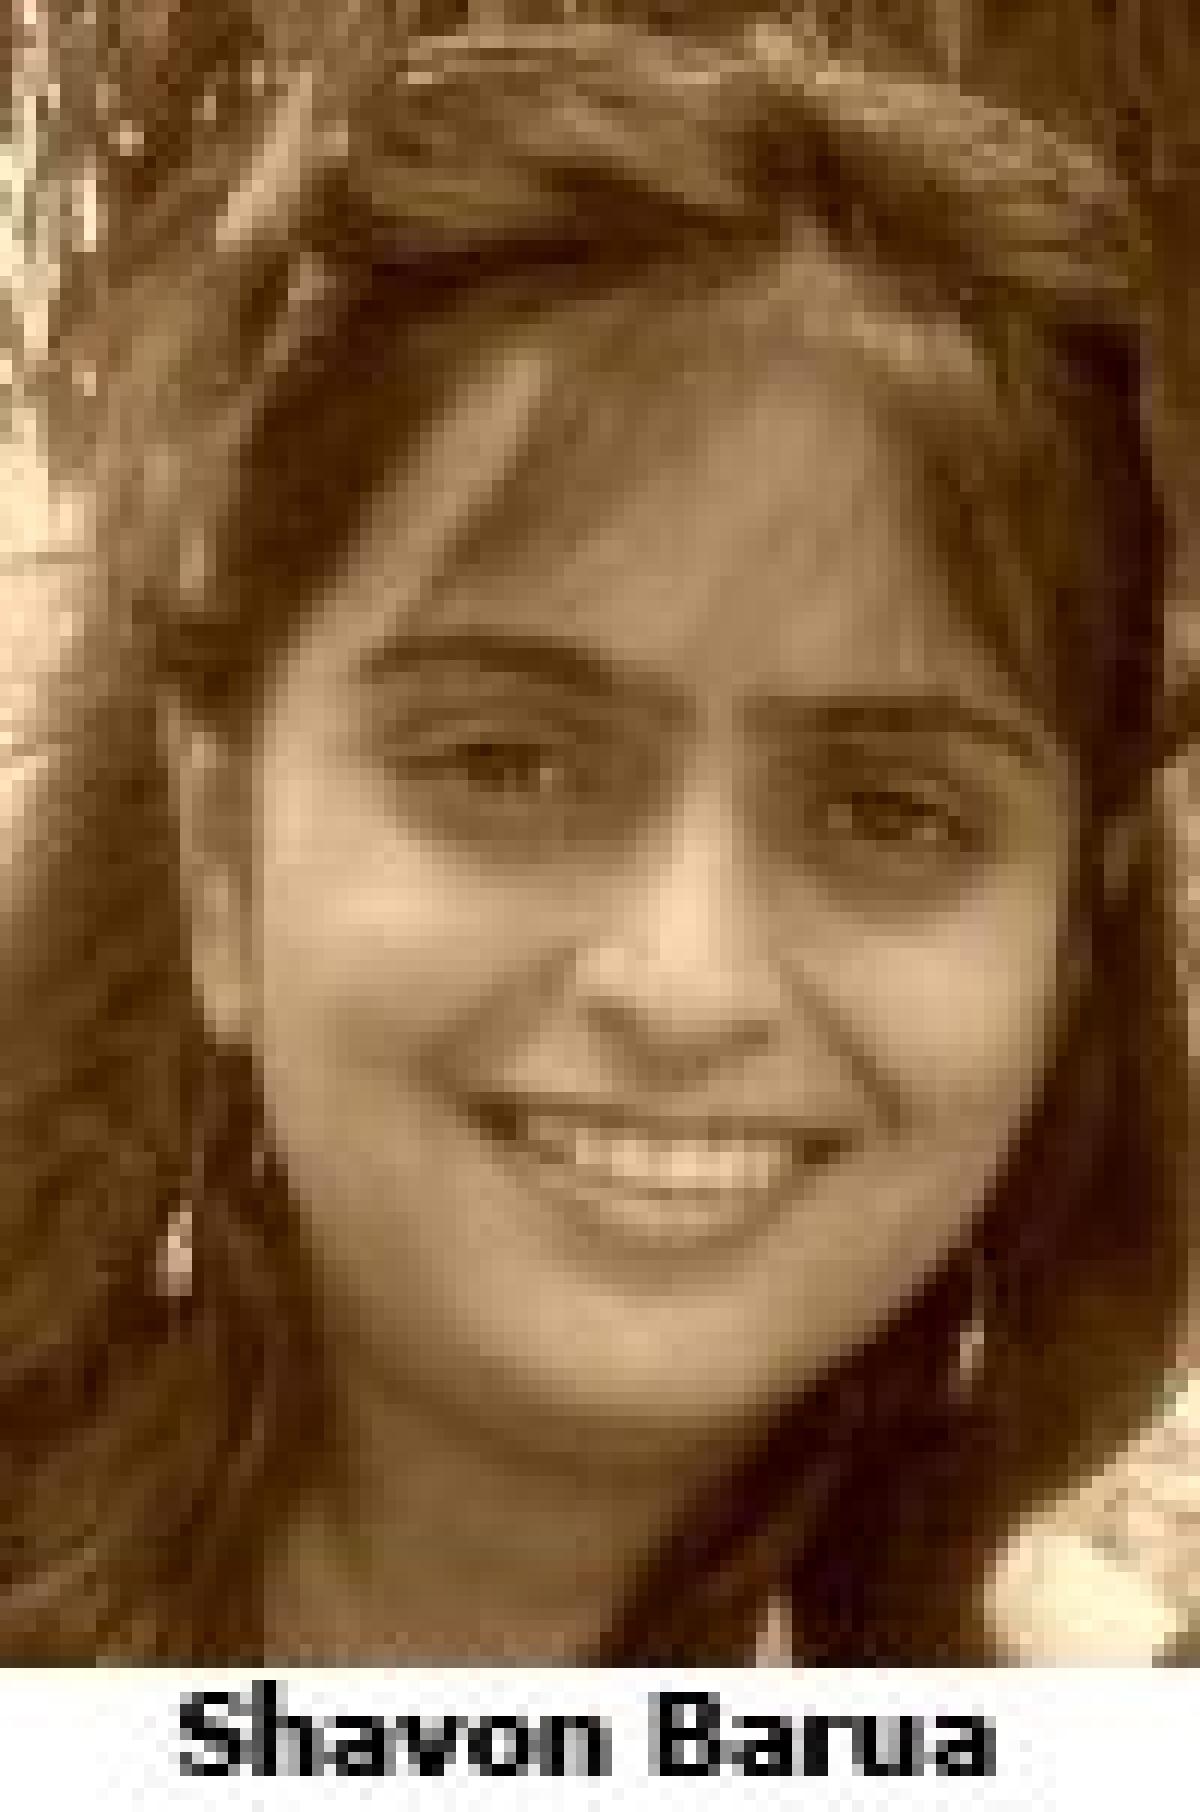 Kareena for Kurkure